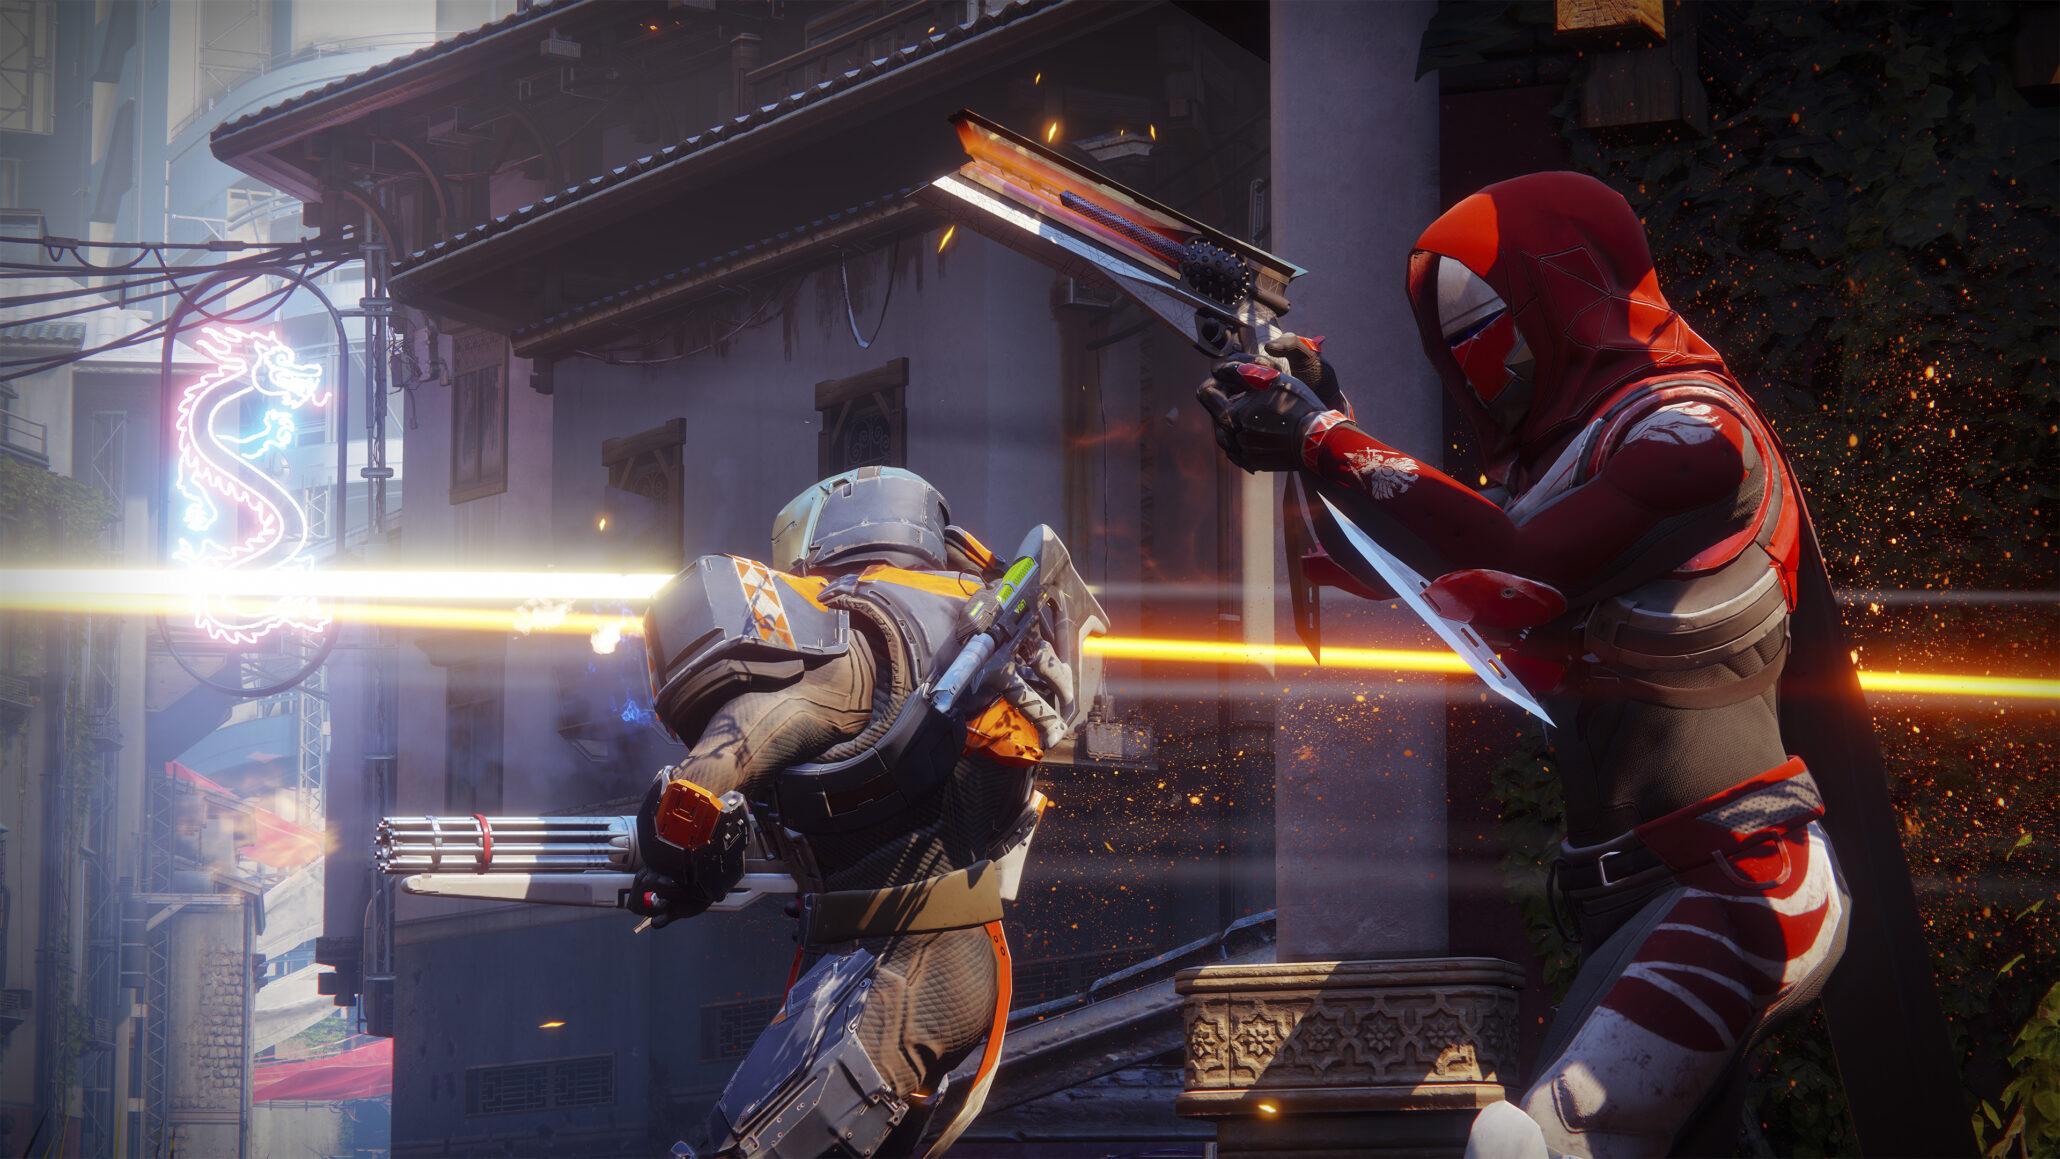 SuperData: Destiny 2 Will Sell 3 Million Digital Copies in 3